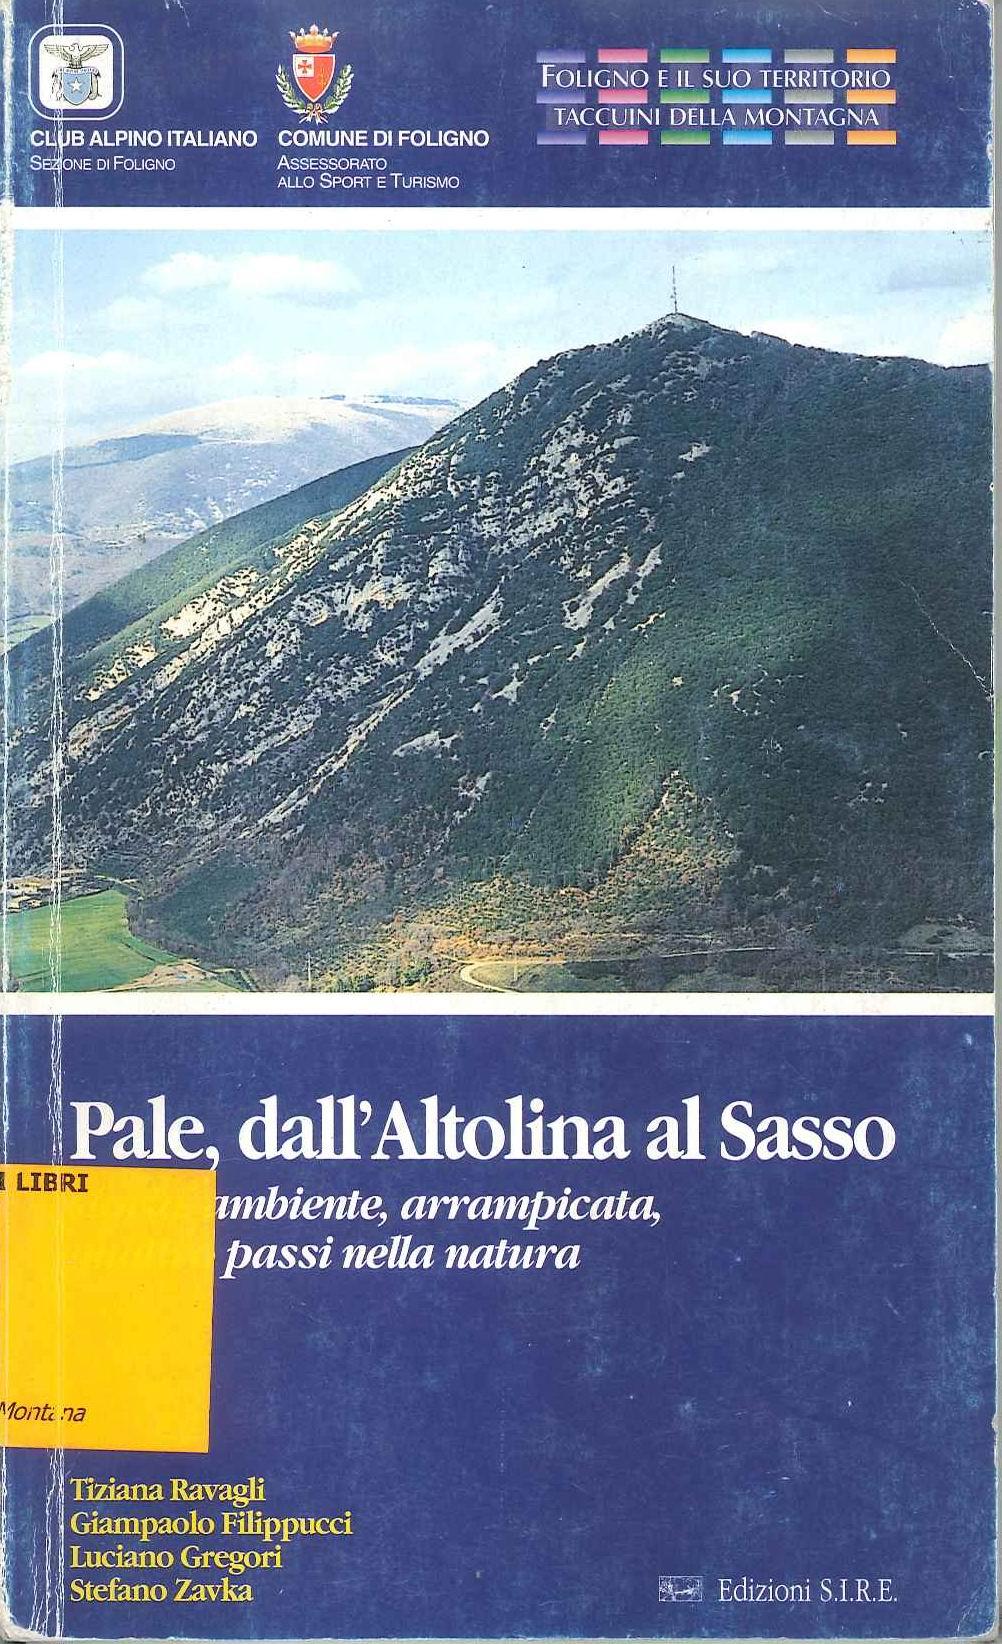 Pale dall'Altolina al Sasso (copertina, 2003)